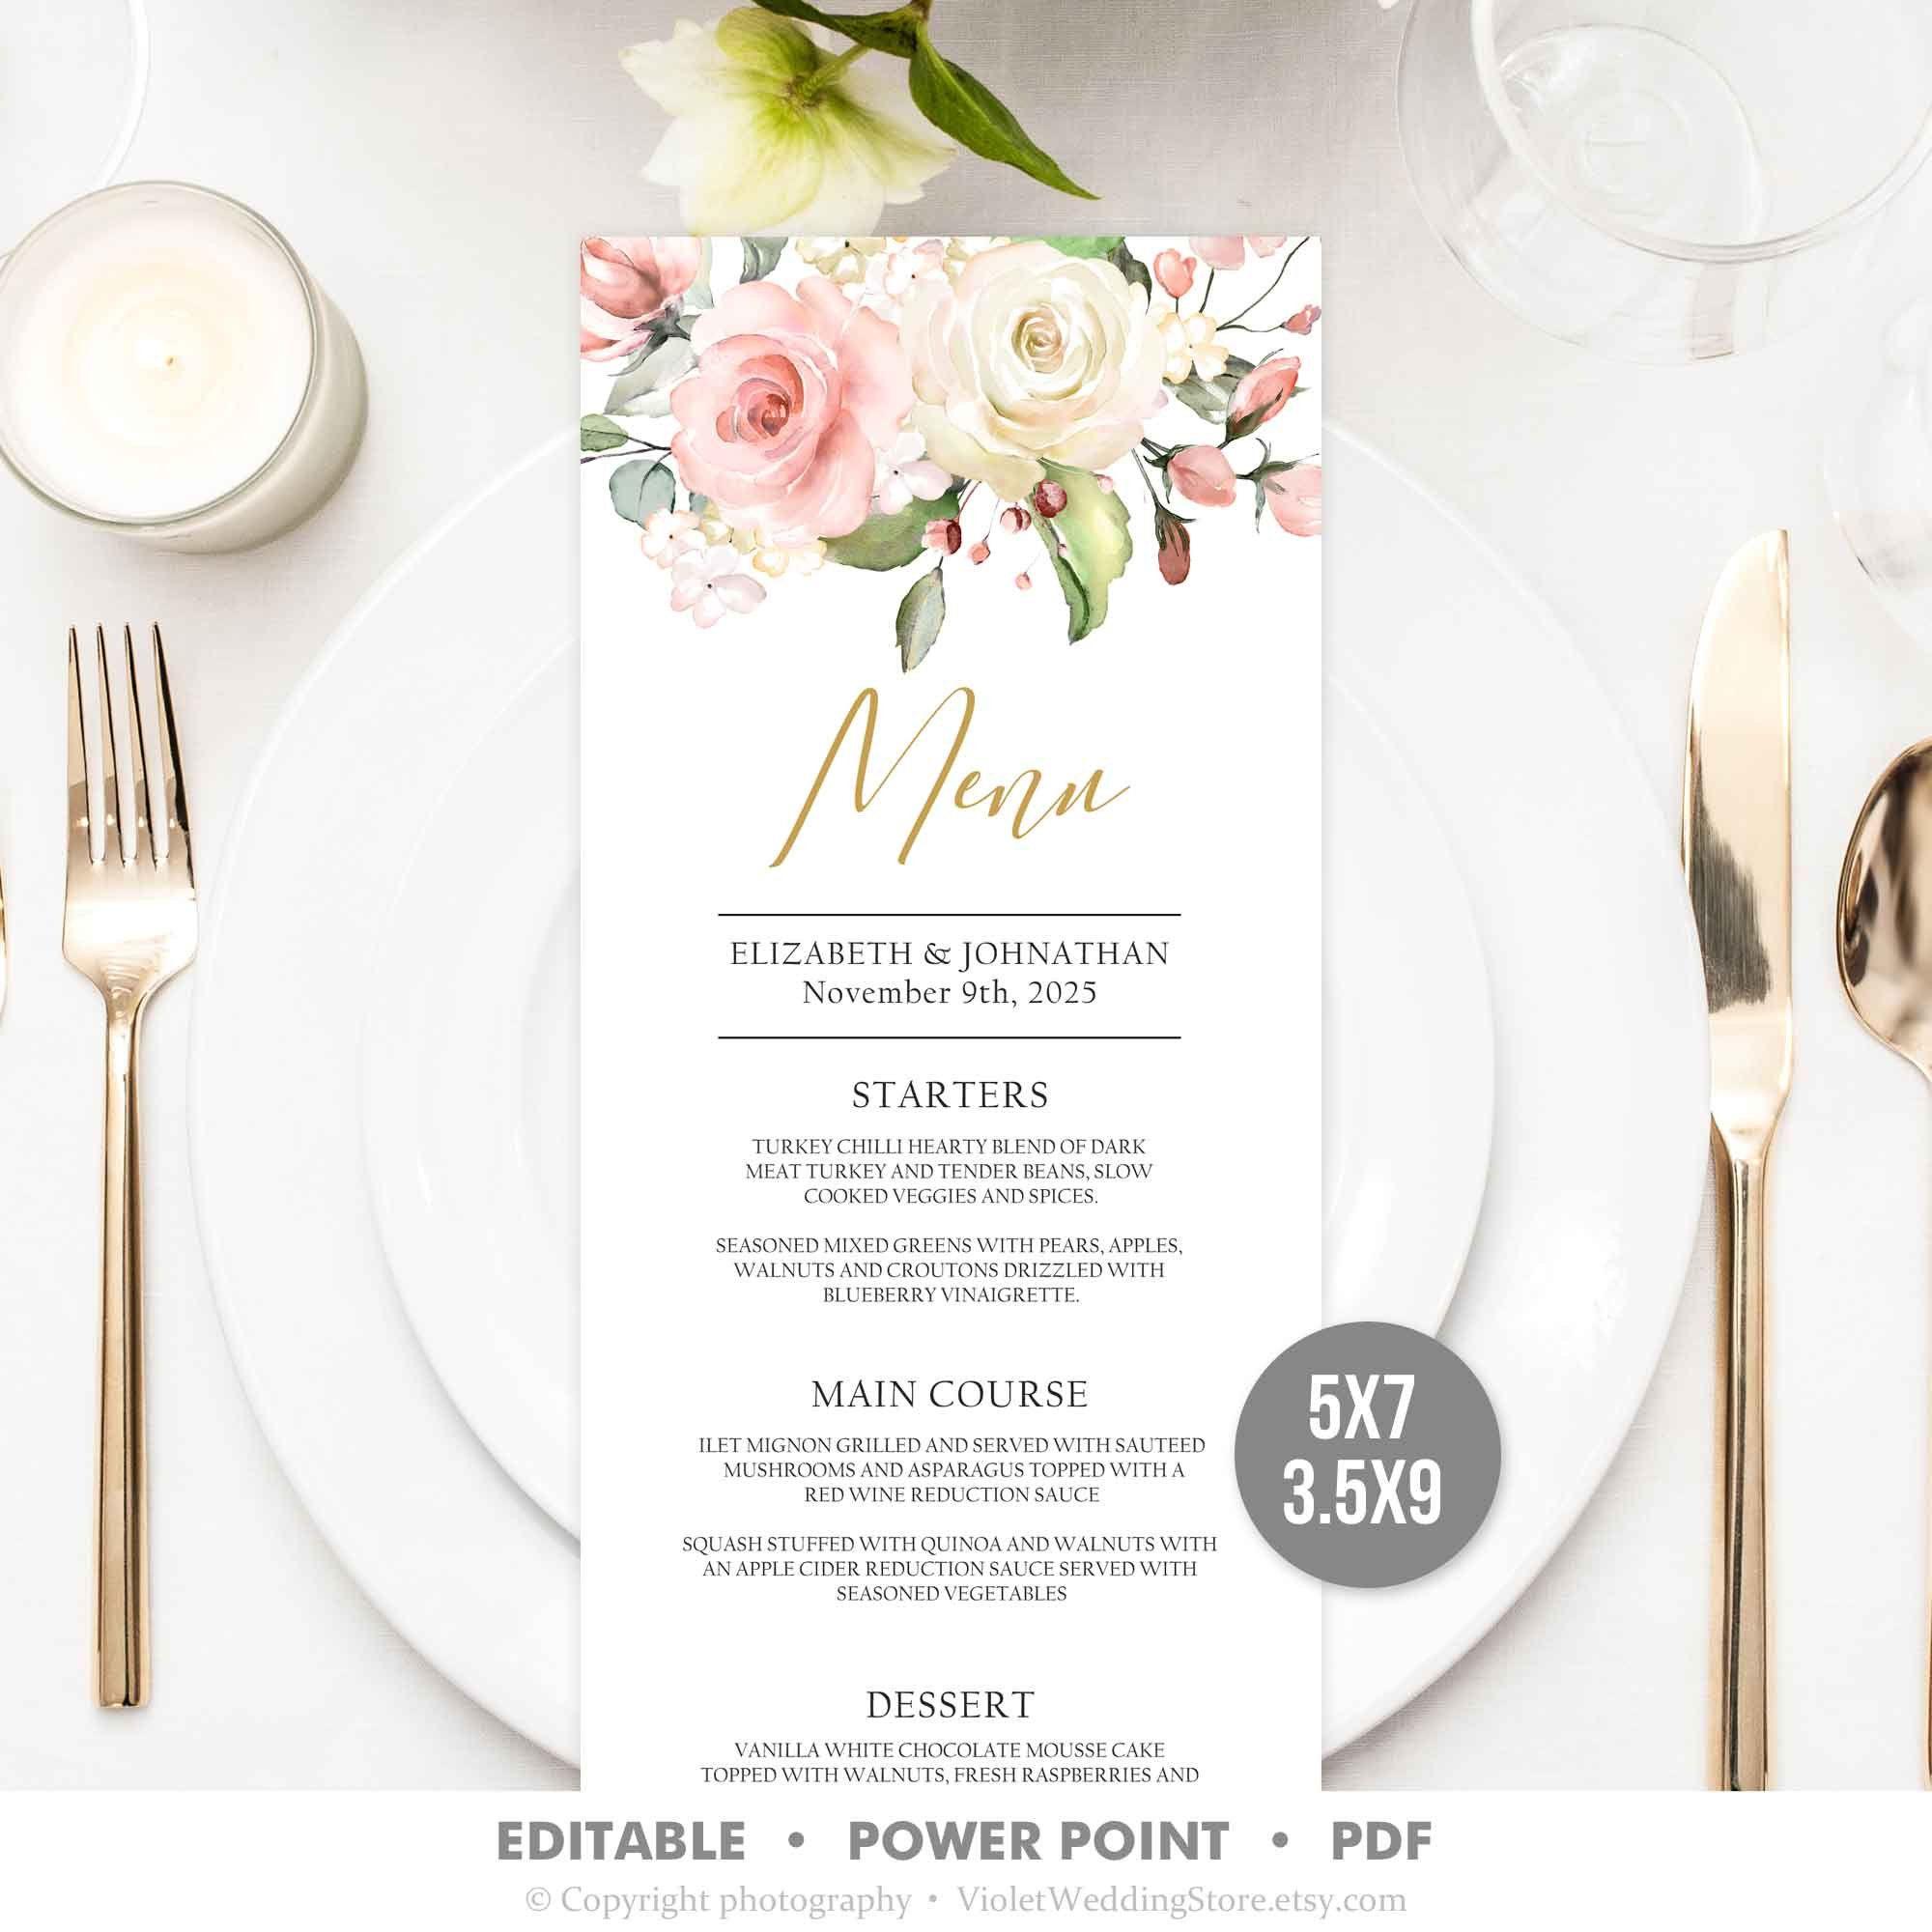 Boho Blush Pink Roses Menu Template, Floral Wedding Menu Printable, Edit Youself Dinner Menu INSTANT DOWNLOAD BPRS74 #weddingmenutemplate